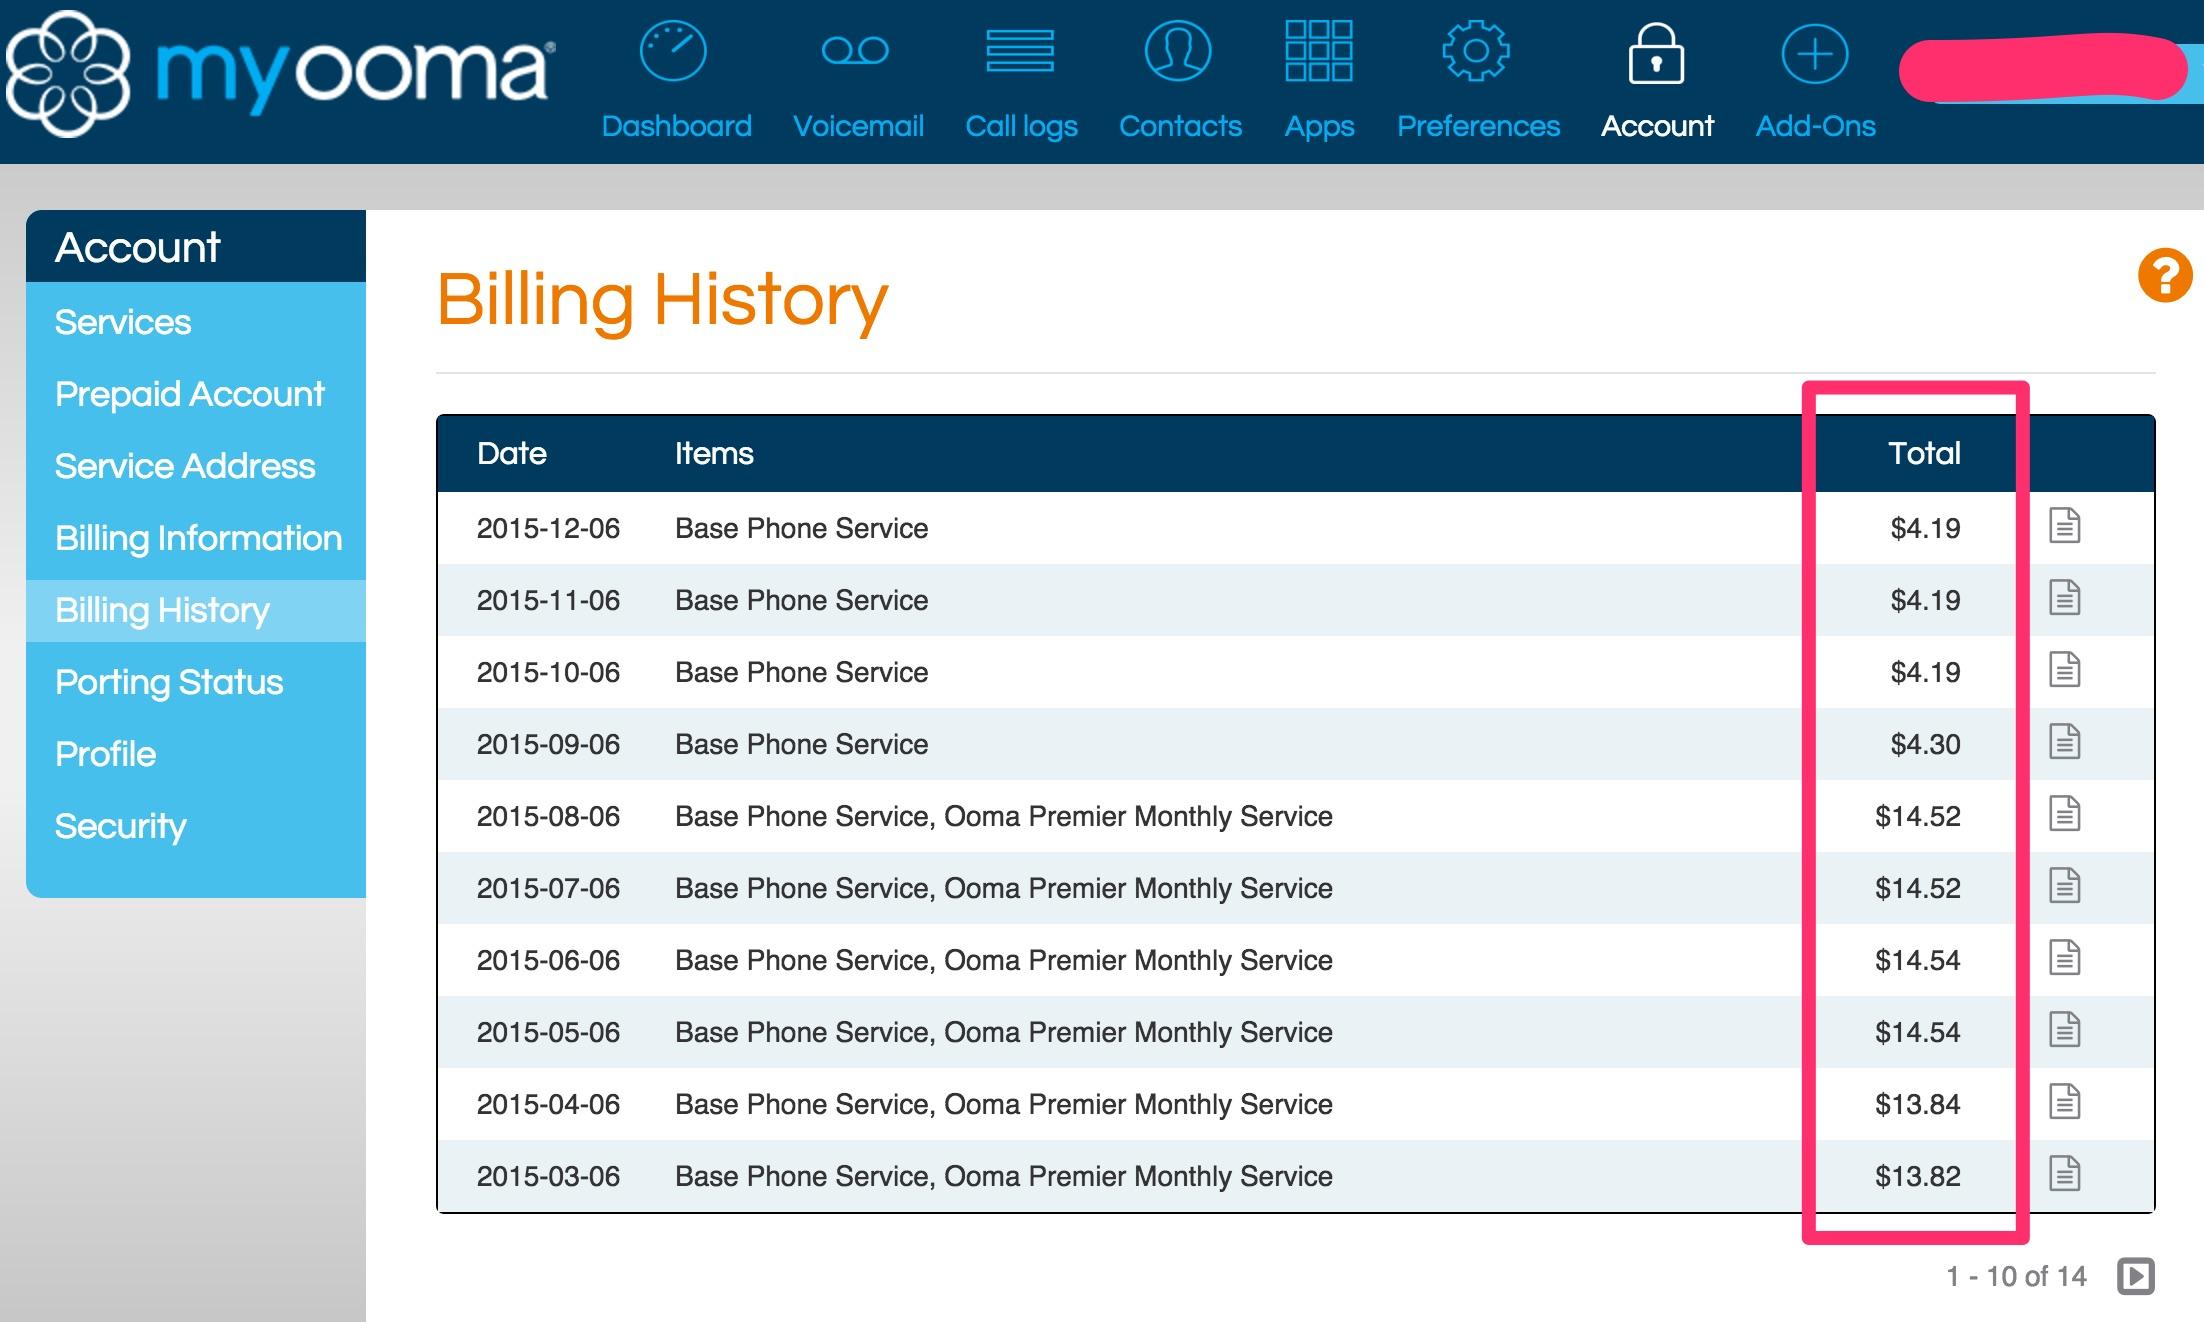 myooma-billing